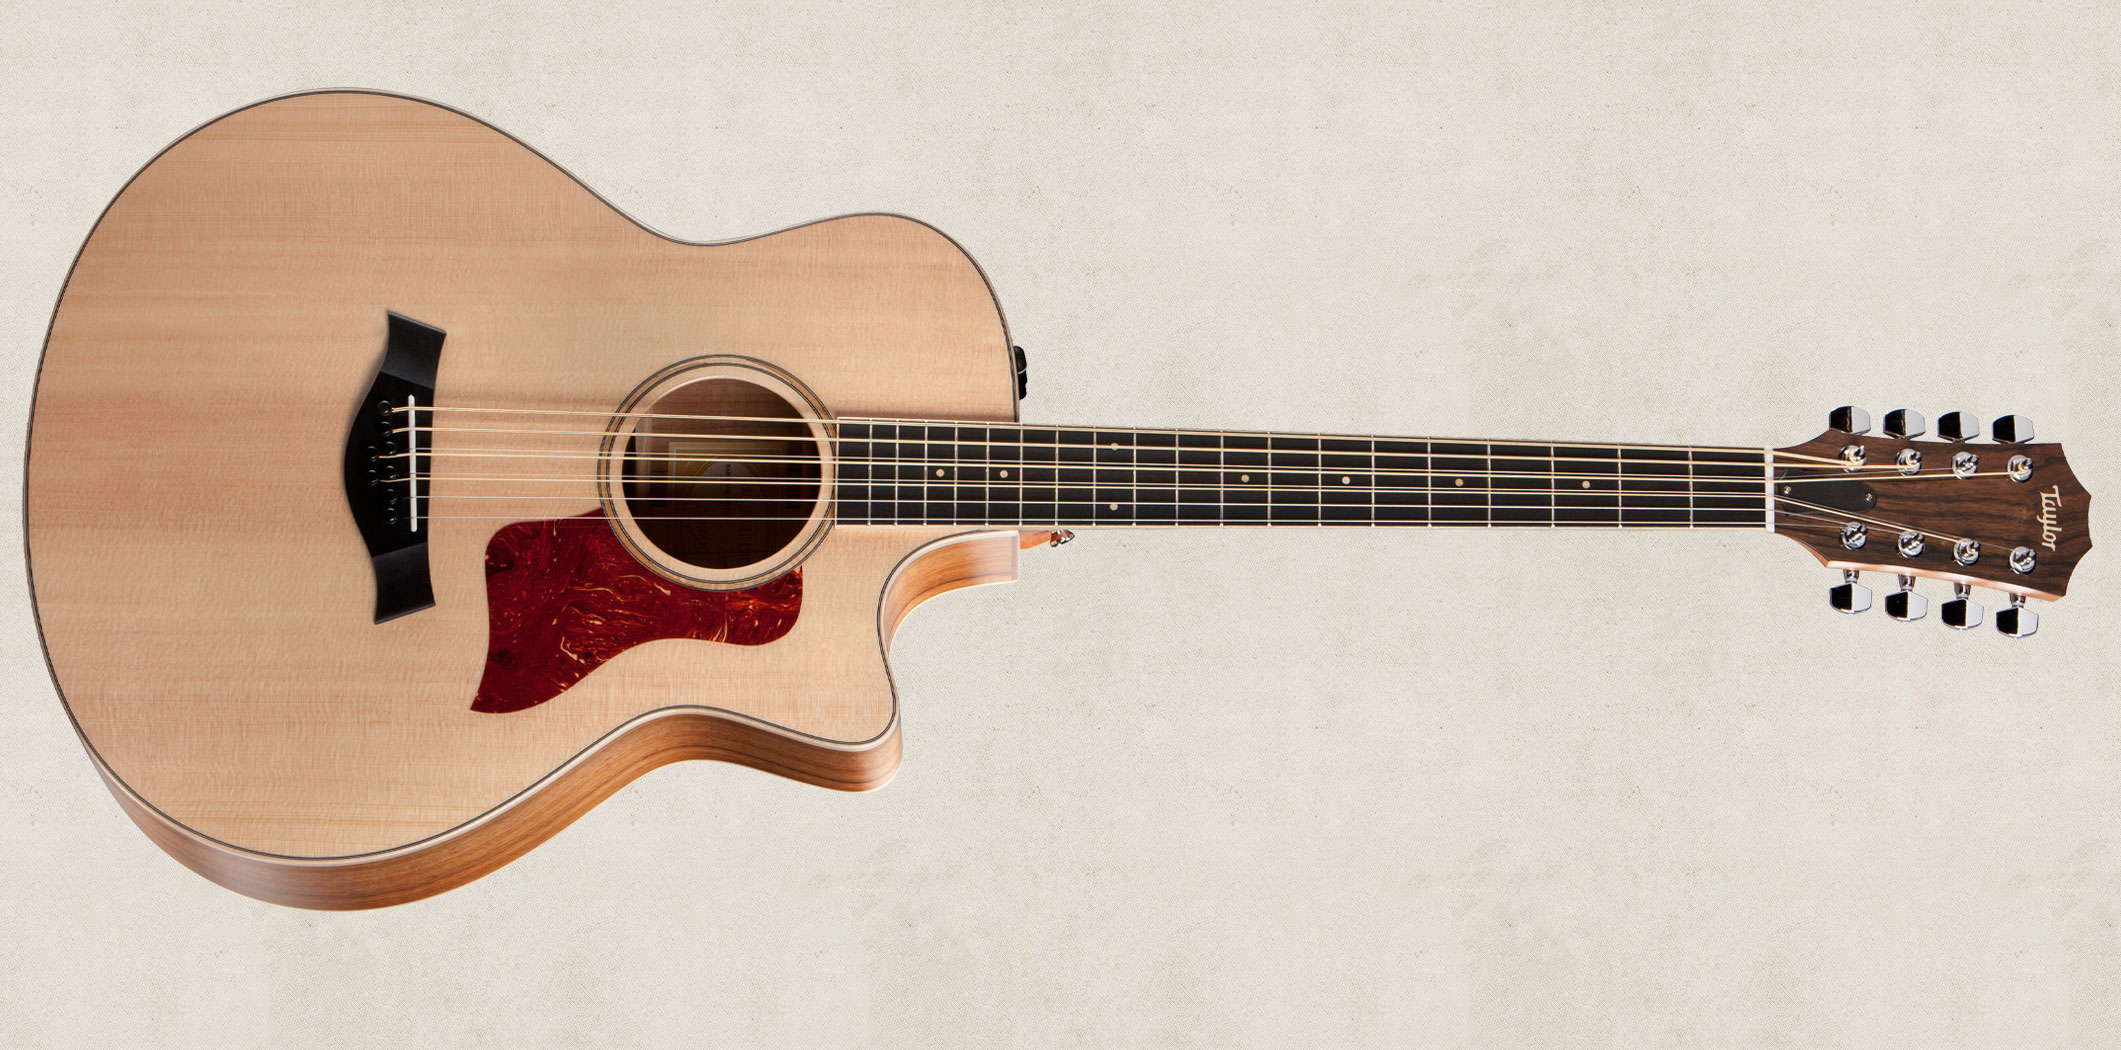 baritone 8 fltd b taylor guitars. Black Bedroom Furniture Sets. Home Design Ideas